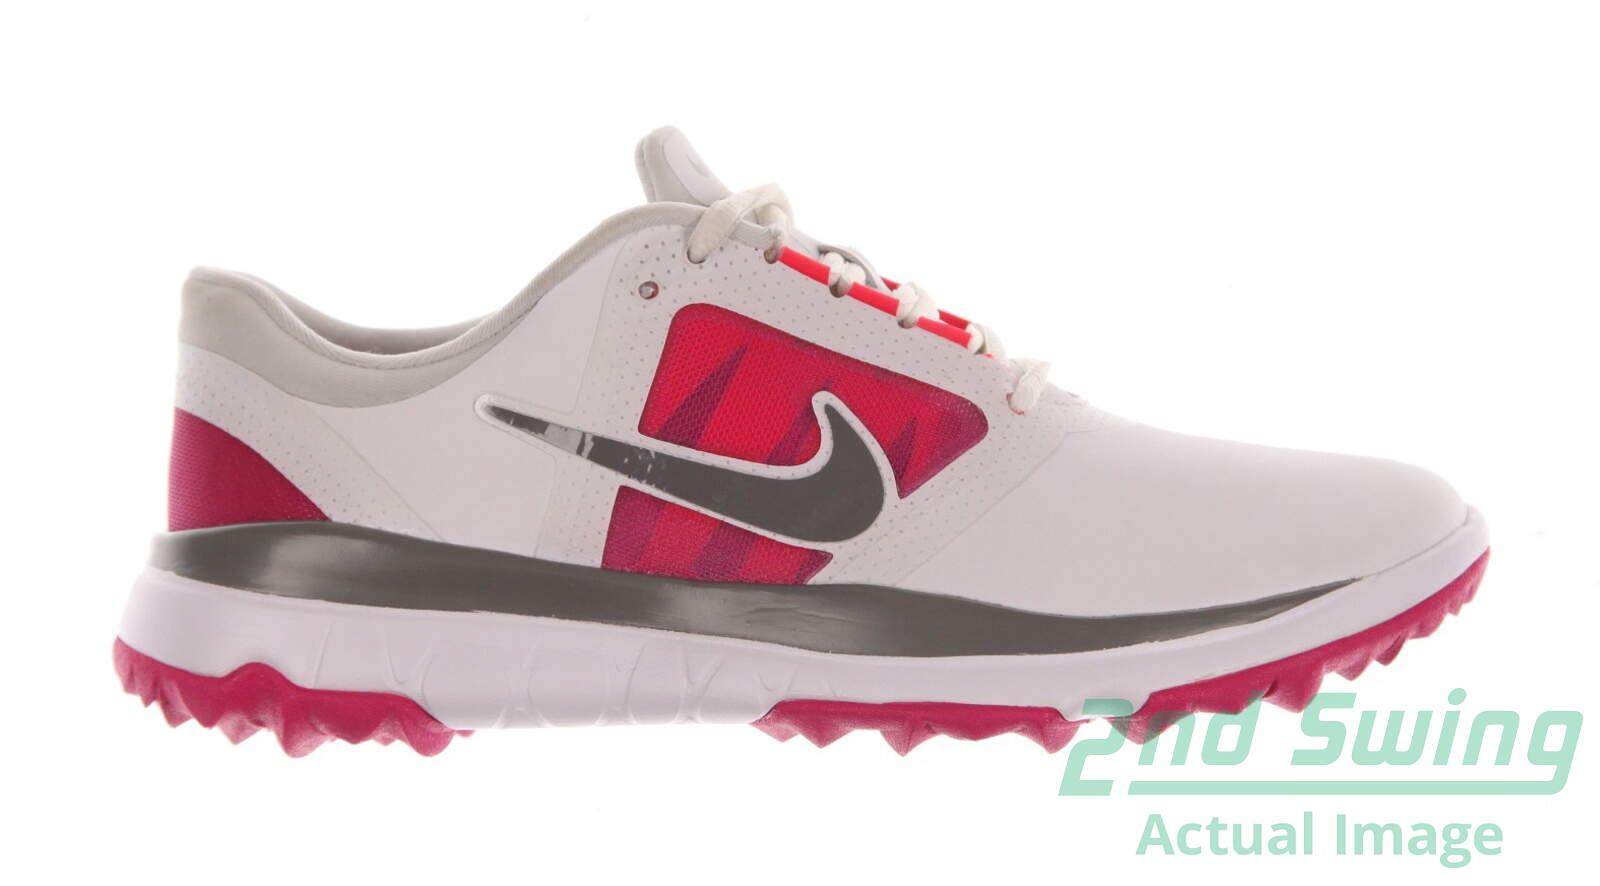 c9a0f717f188 New Womens Golf Shoe Nike Fi Impact Medium 10 White Pink MSRP  130 - Golf  Footwear